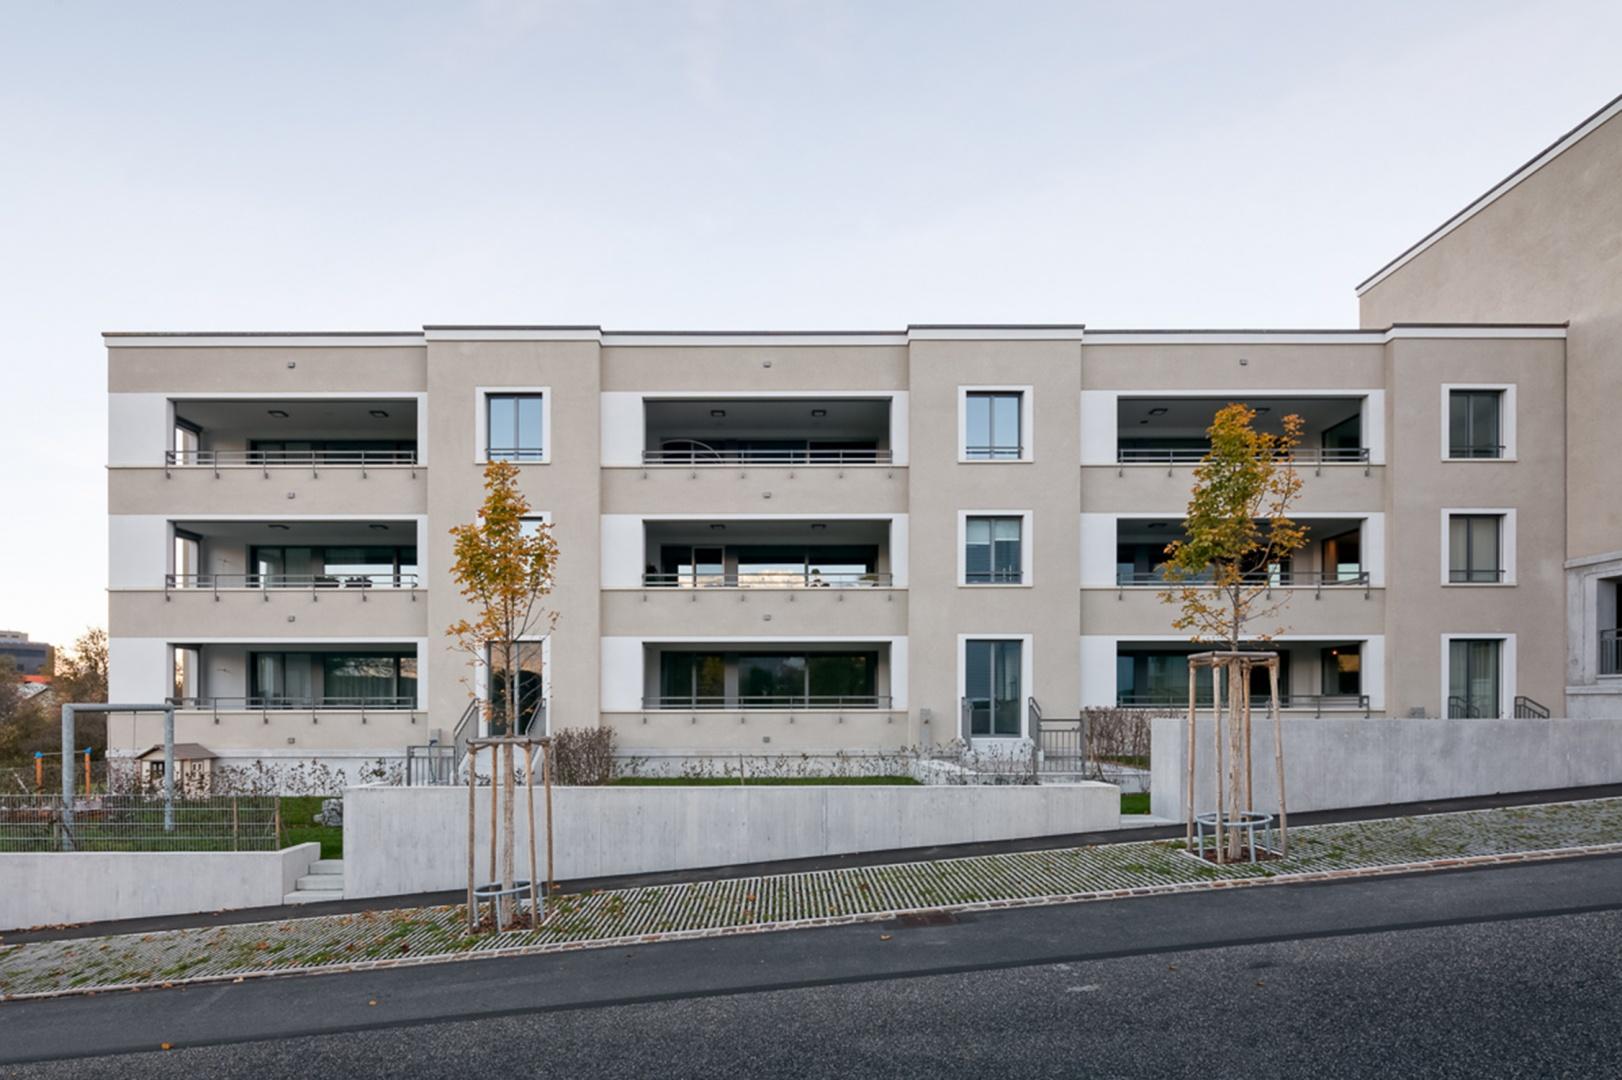 Neubau mehrfamilienhaus lehenwies arc award for Mehrfamilienhaus neubau